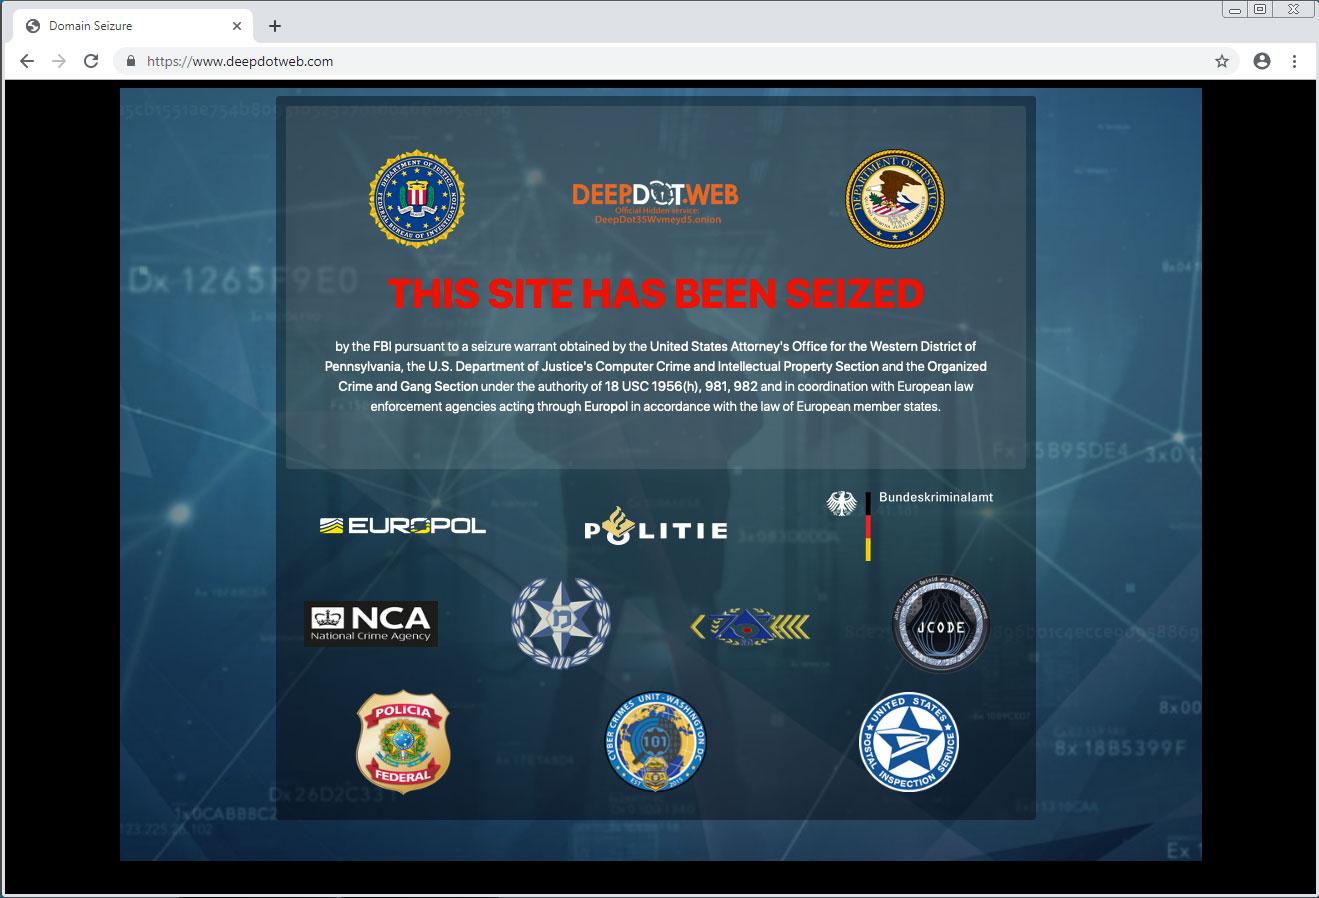 DeepDotWeb Seized by FBI